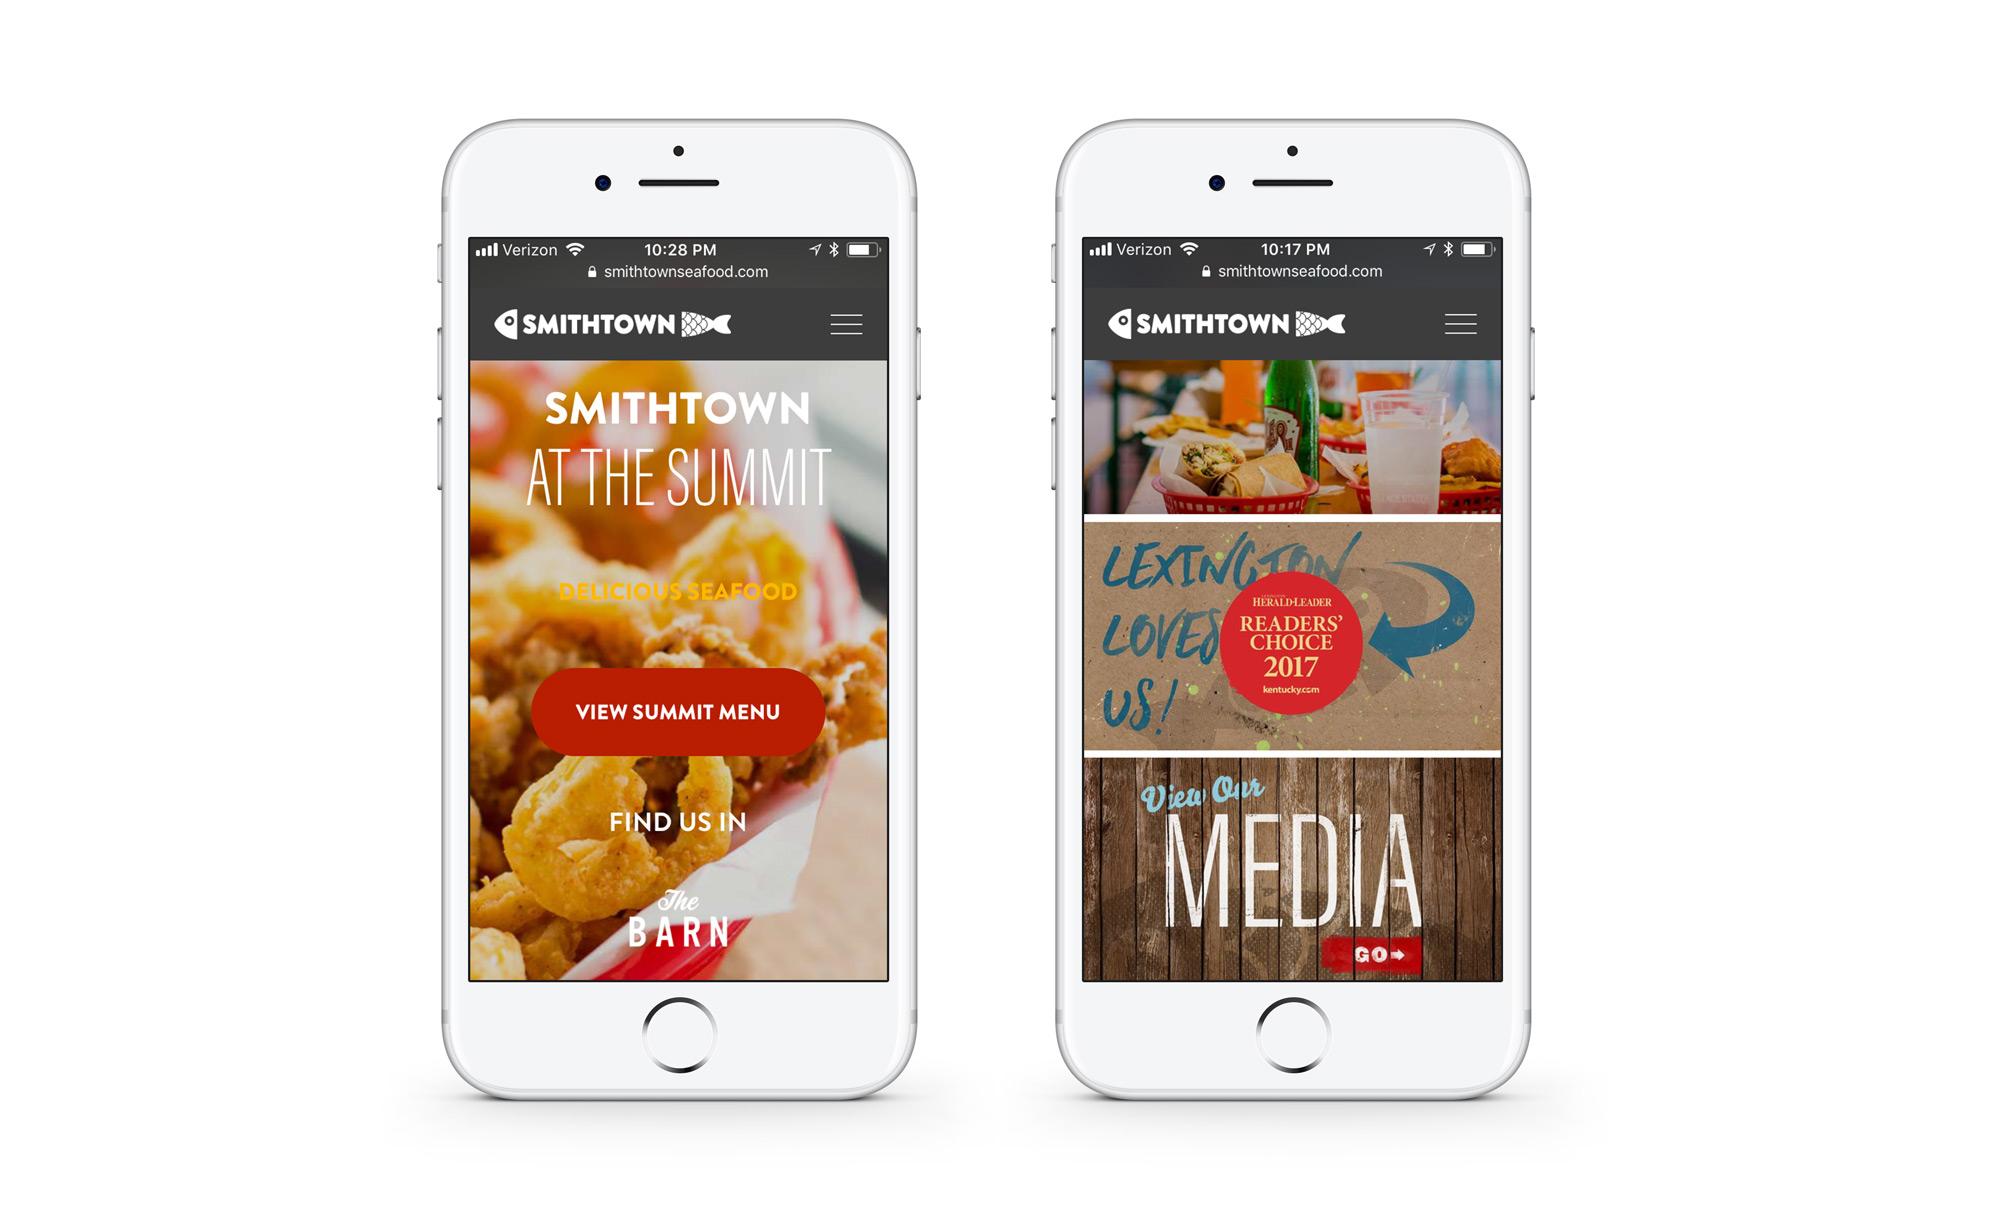 iPhone-7-smithtown-2-screens-1.jpg